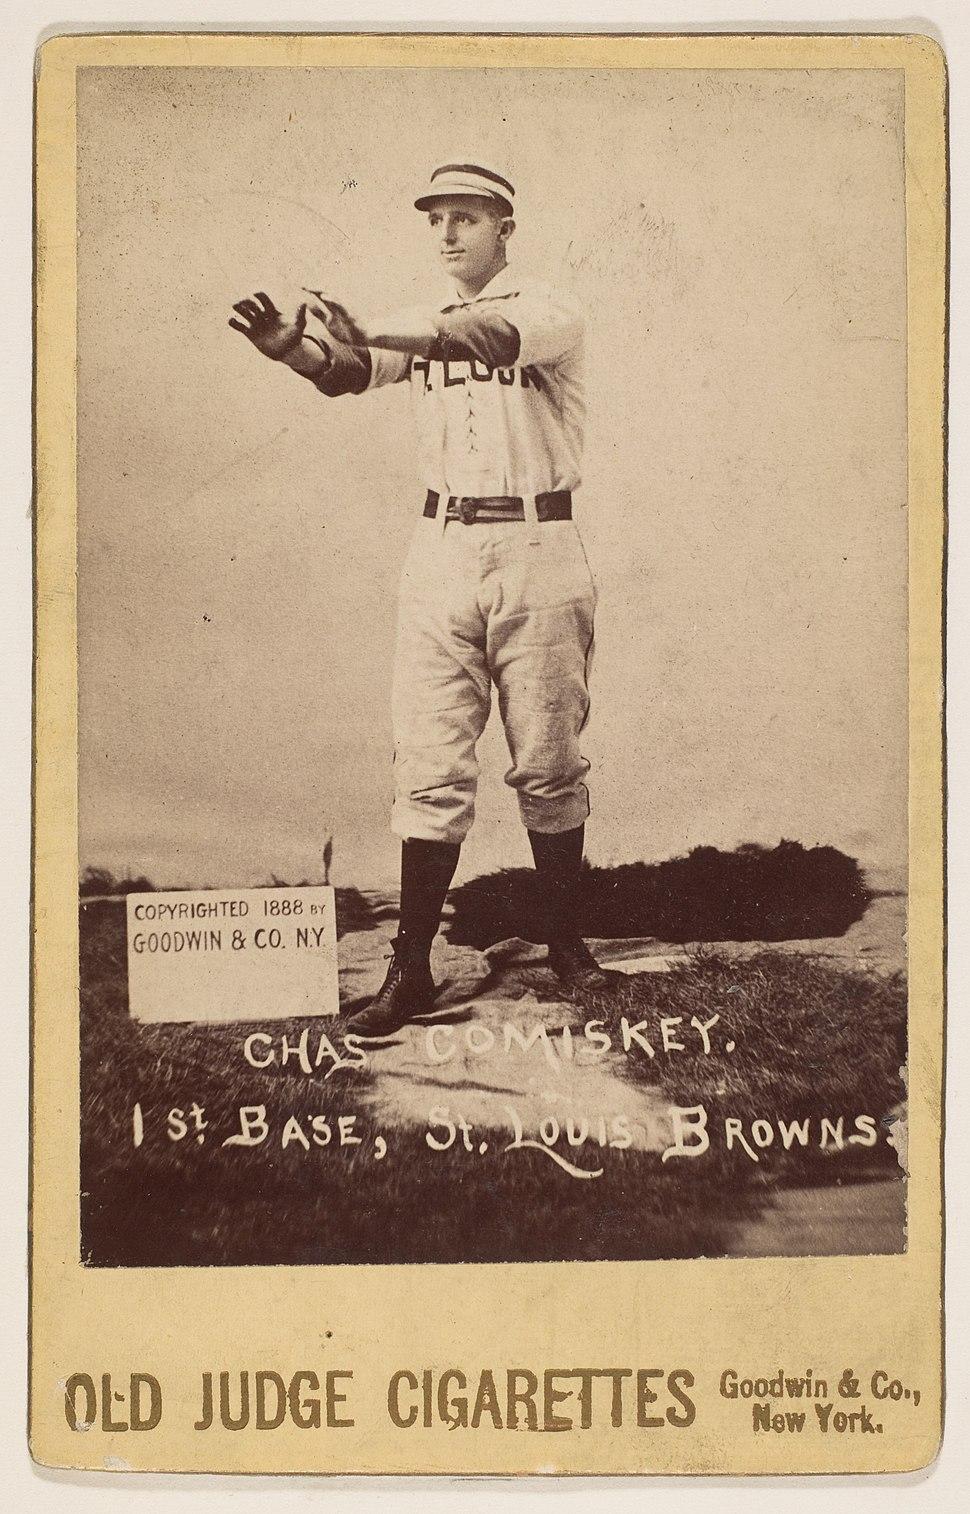 Charles Comiskey Old Judge 1888